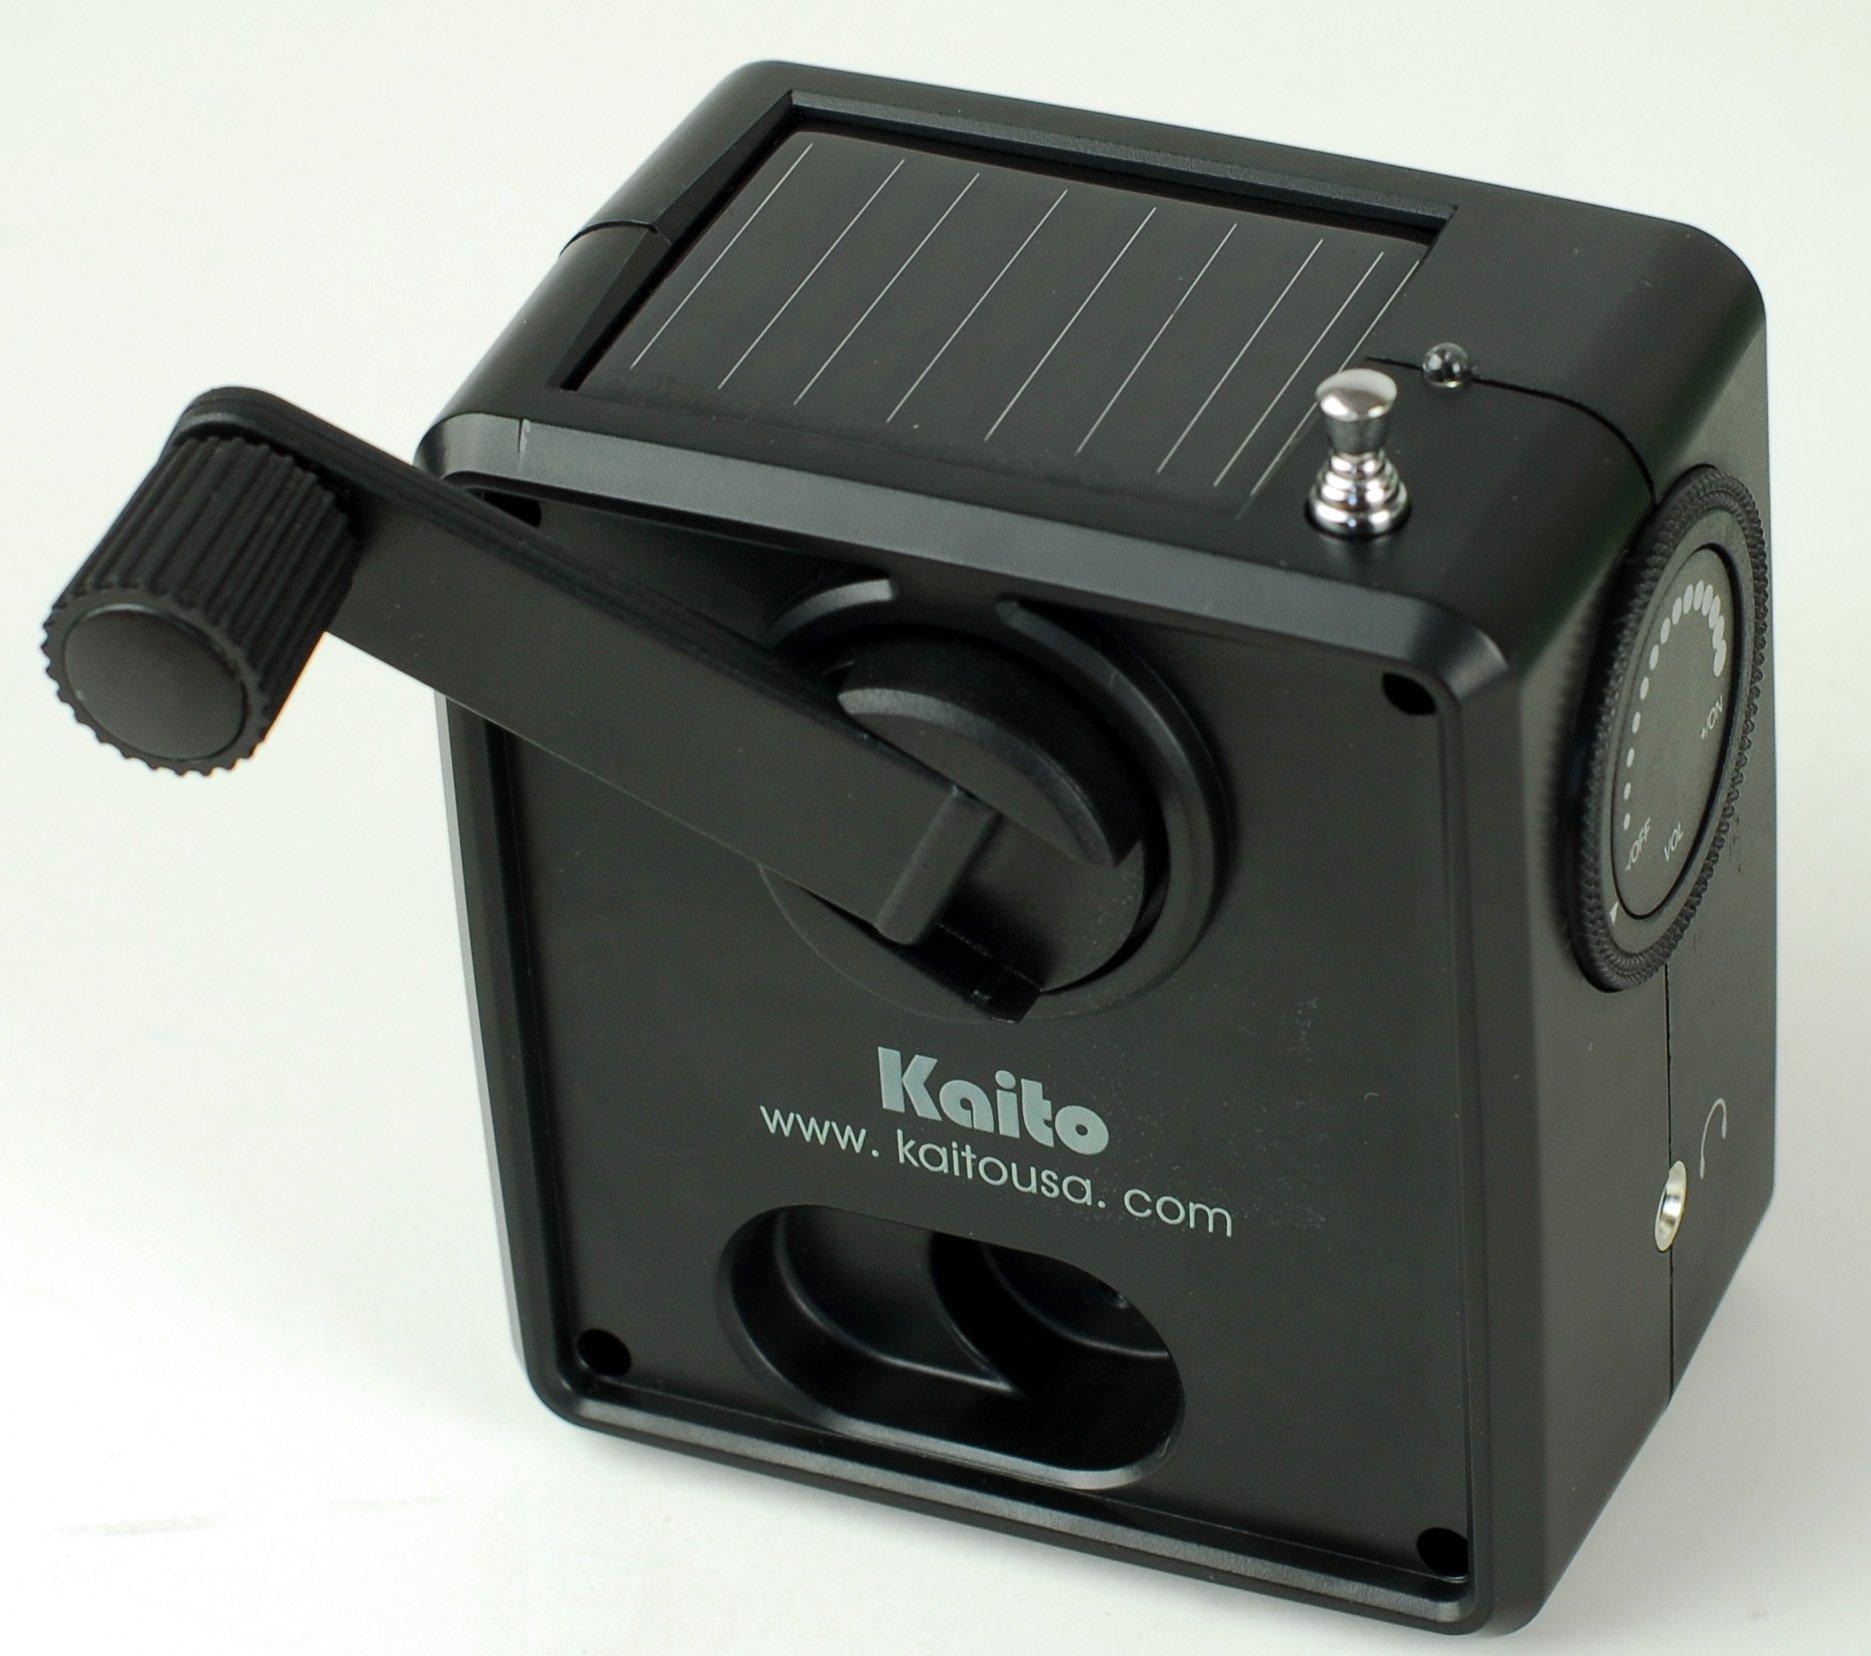 Kaito SB-1059 Mini Hand Crank AM/FM Weather Radio, Black by Kaito